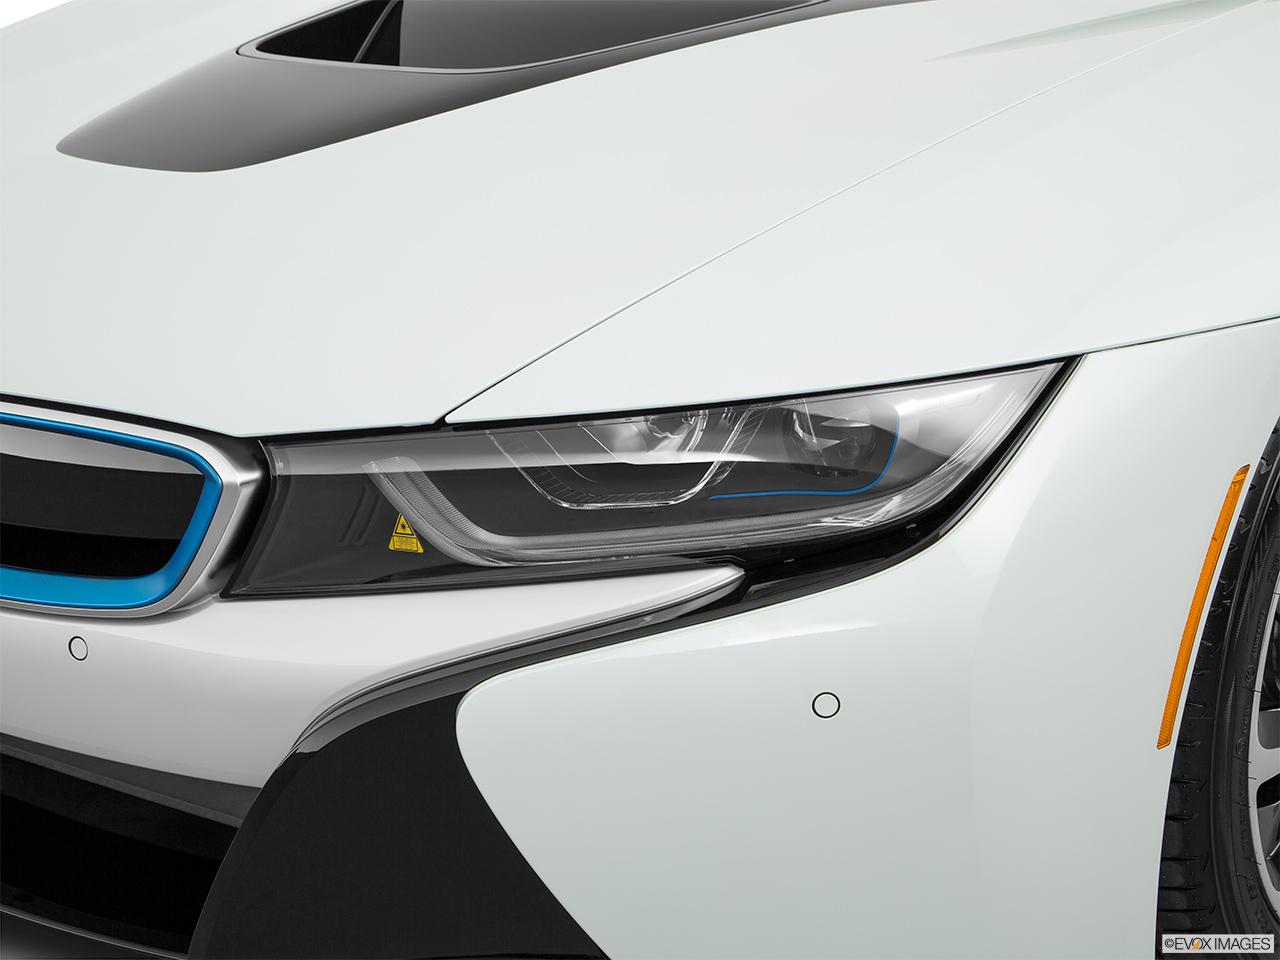 Bmw I8 2017 Plug In Hybrid In Bahrain New Car Prices Specs